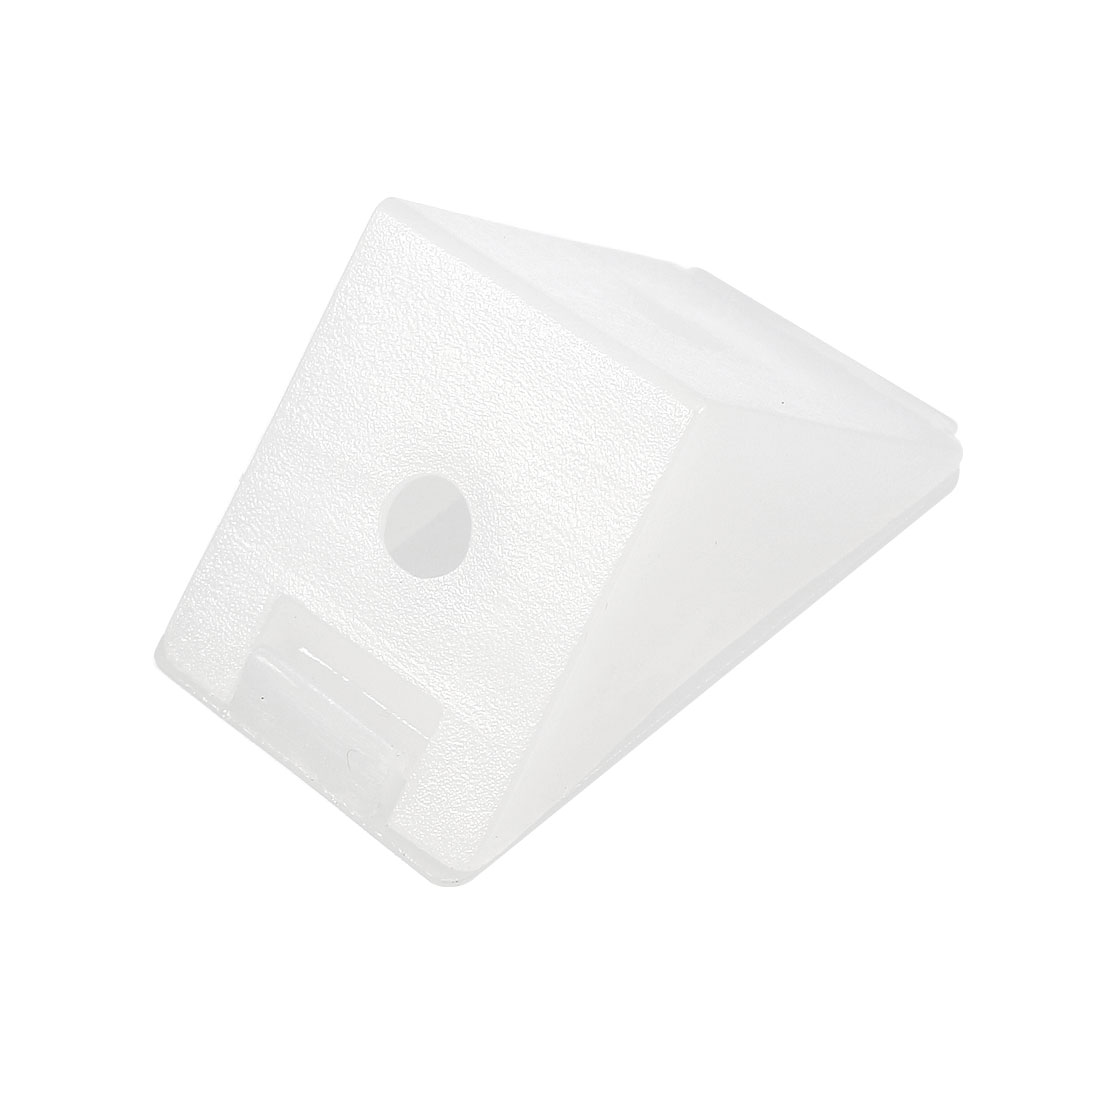 Shelf Cabinet Plastic Corner Braces 2 Holes Angle Brackets w Cover Cap, 10 Pcs